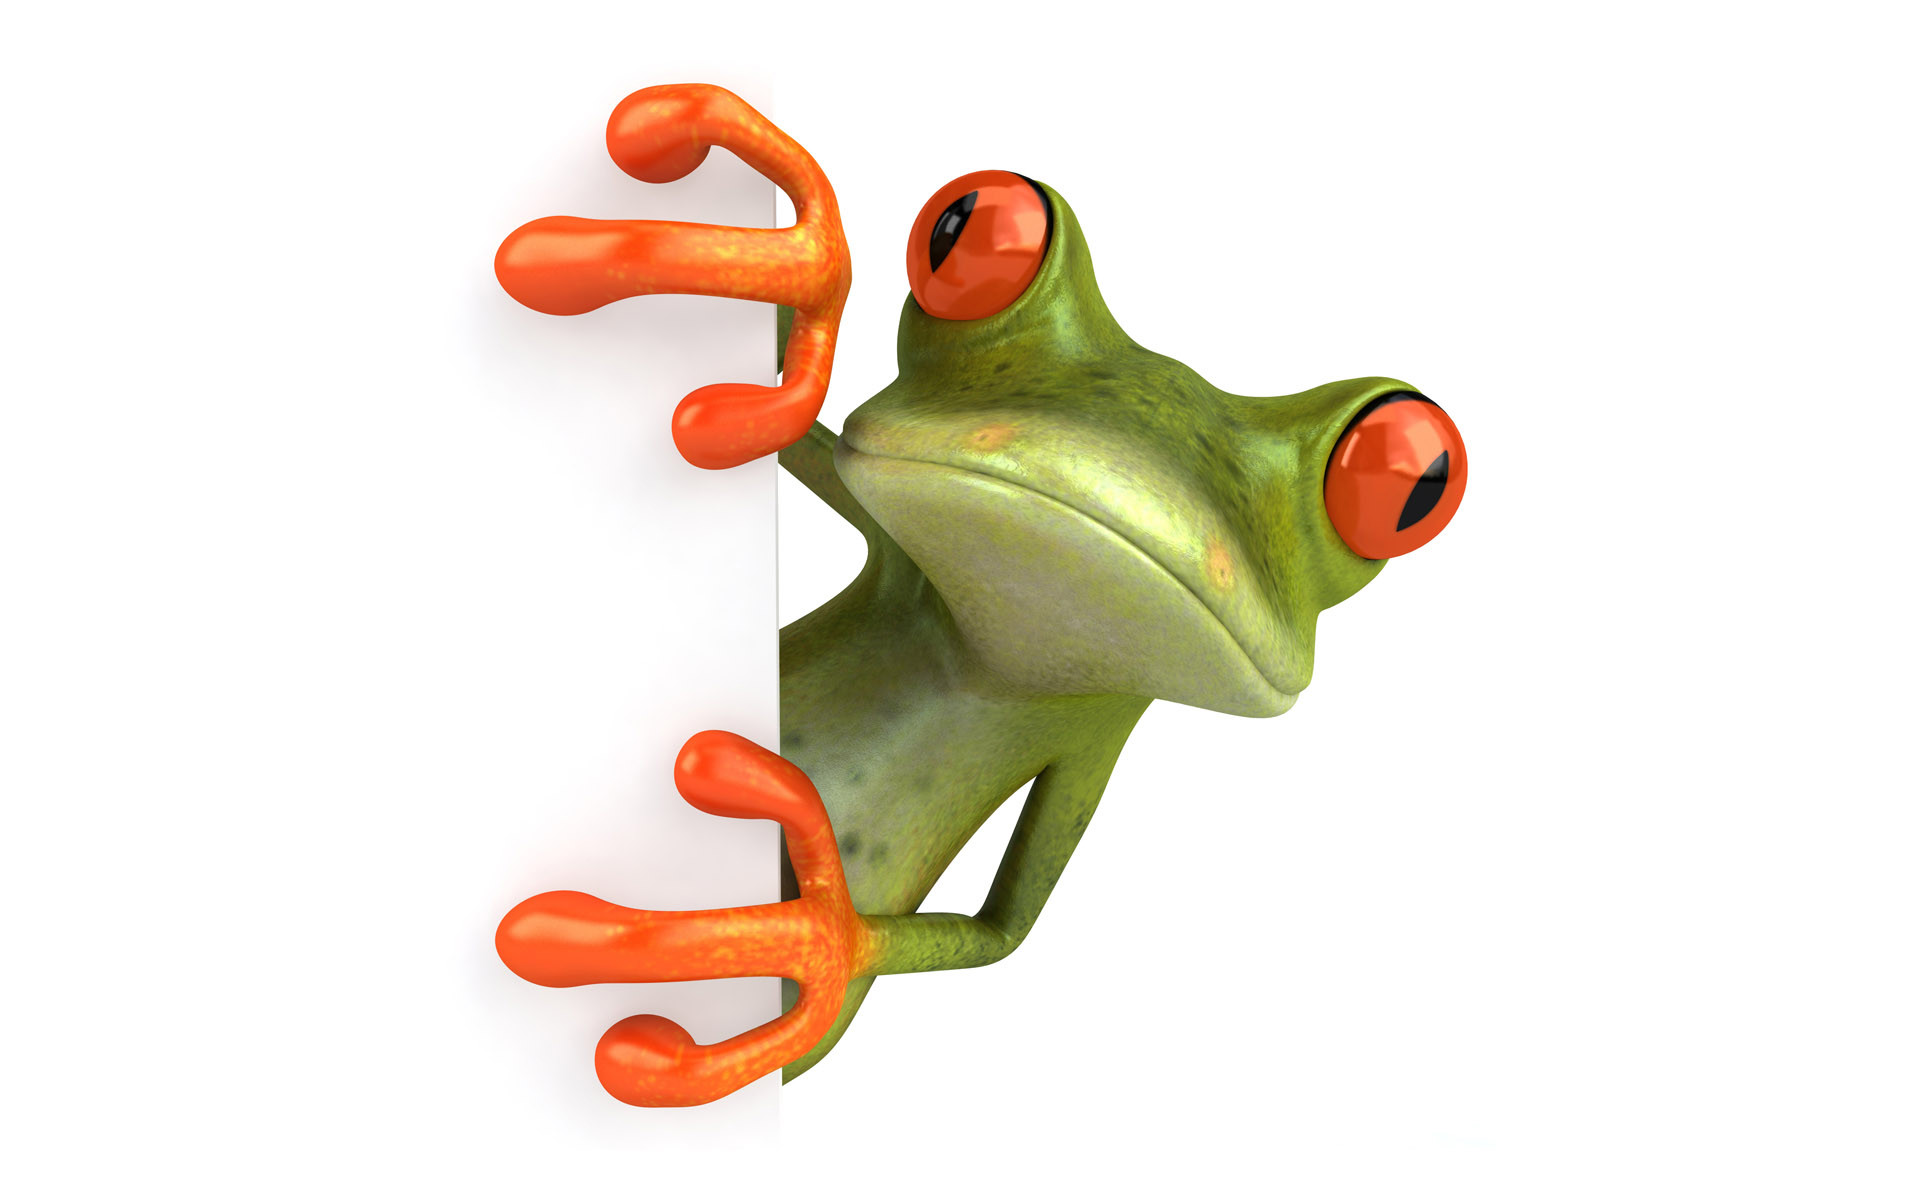 Animated frog wallpaper 55 images - Frog cartoon wallpaper ...